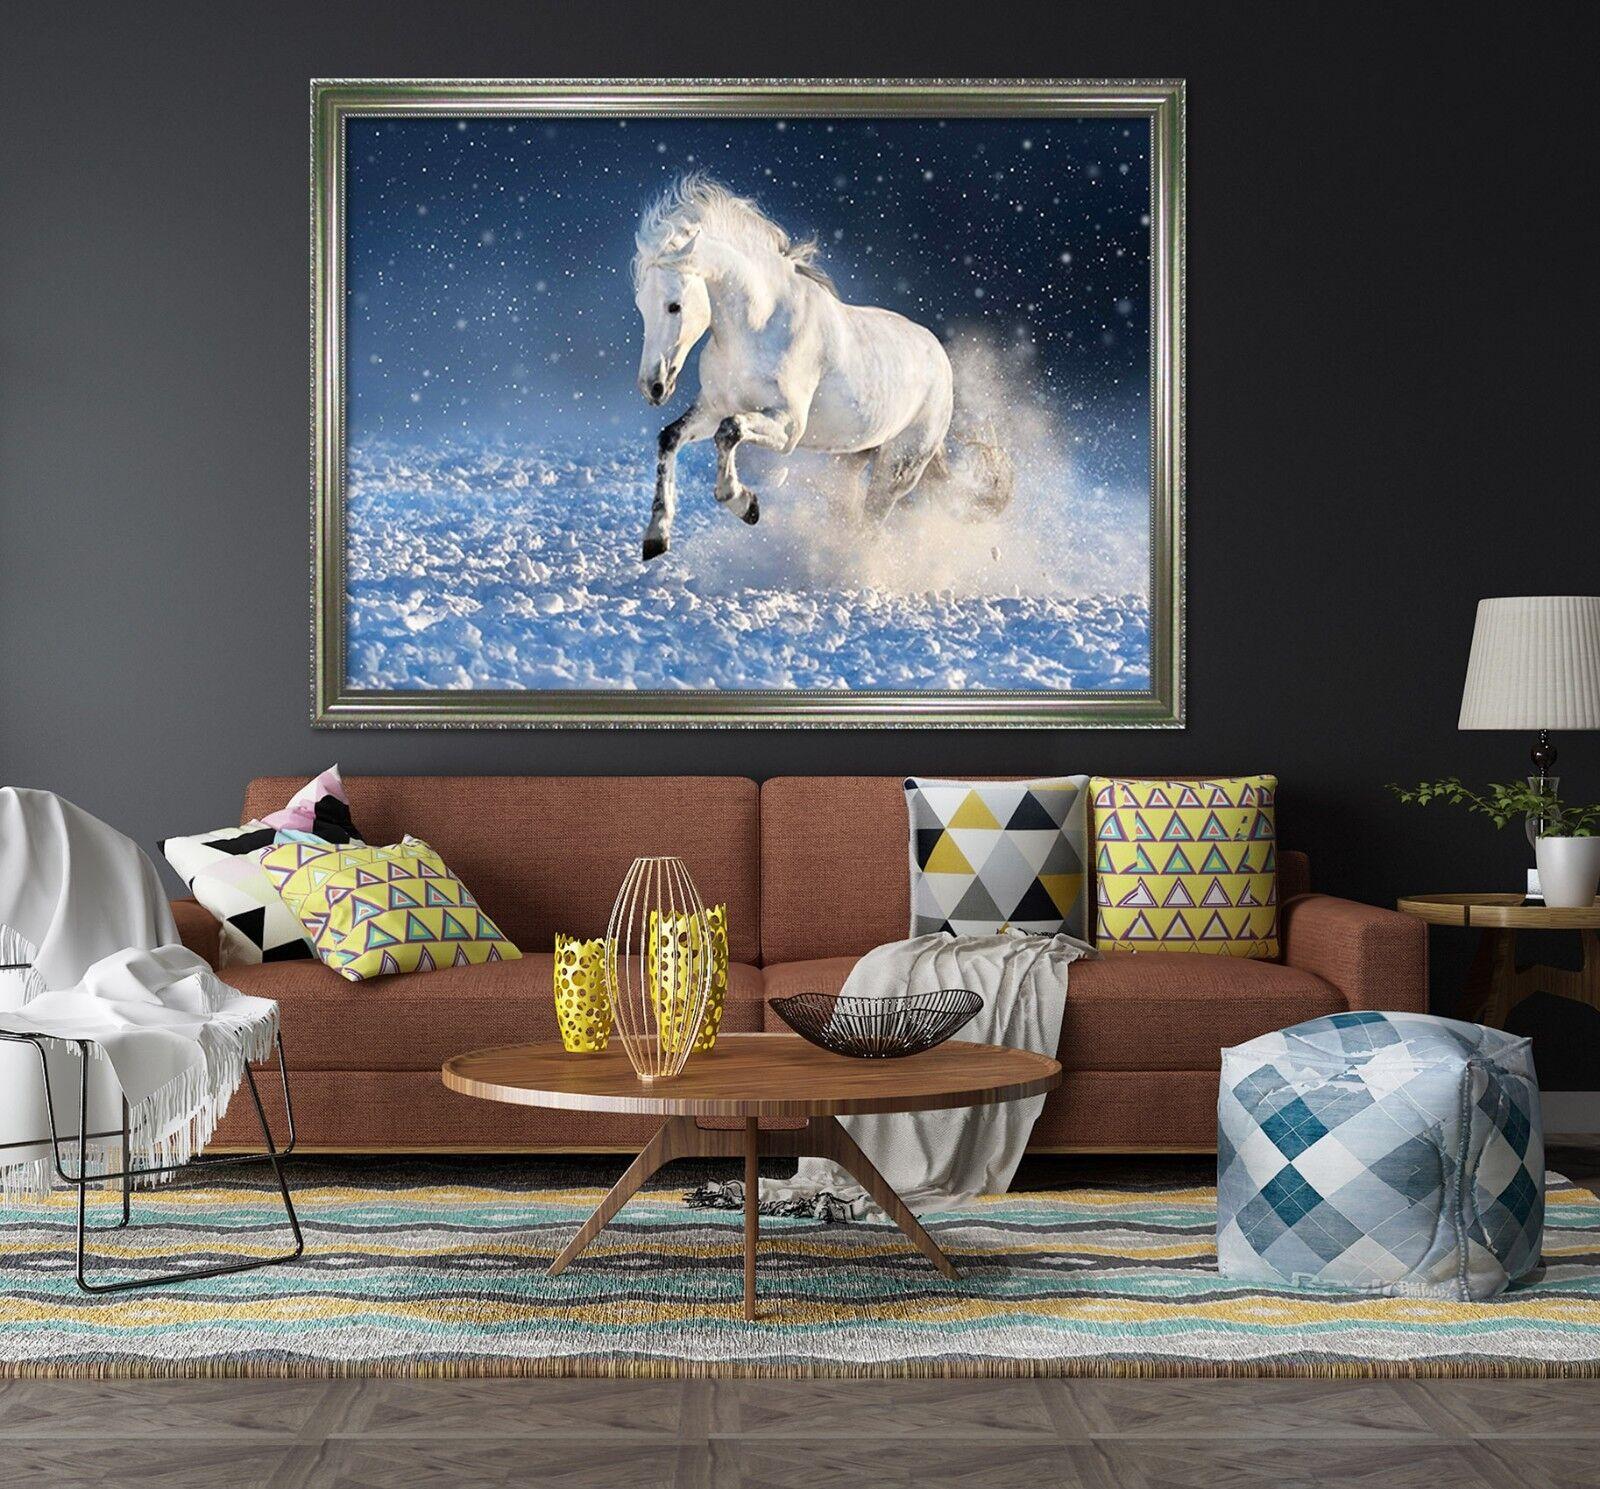 3D Snow Land Horse 2 Framed Poster Home Decor Print Painting Art AJ WALLPAPER